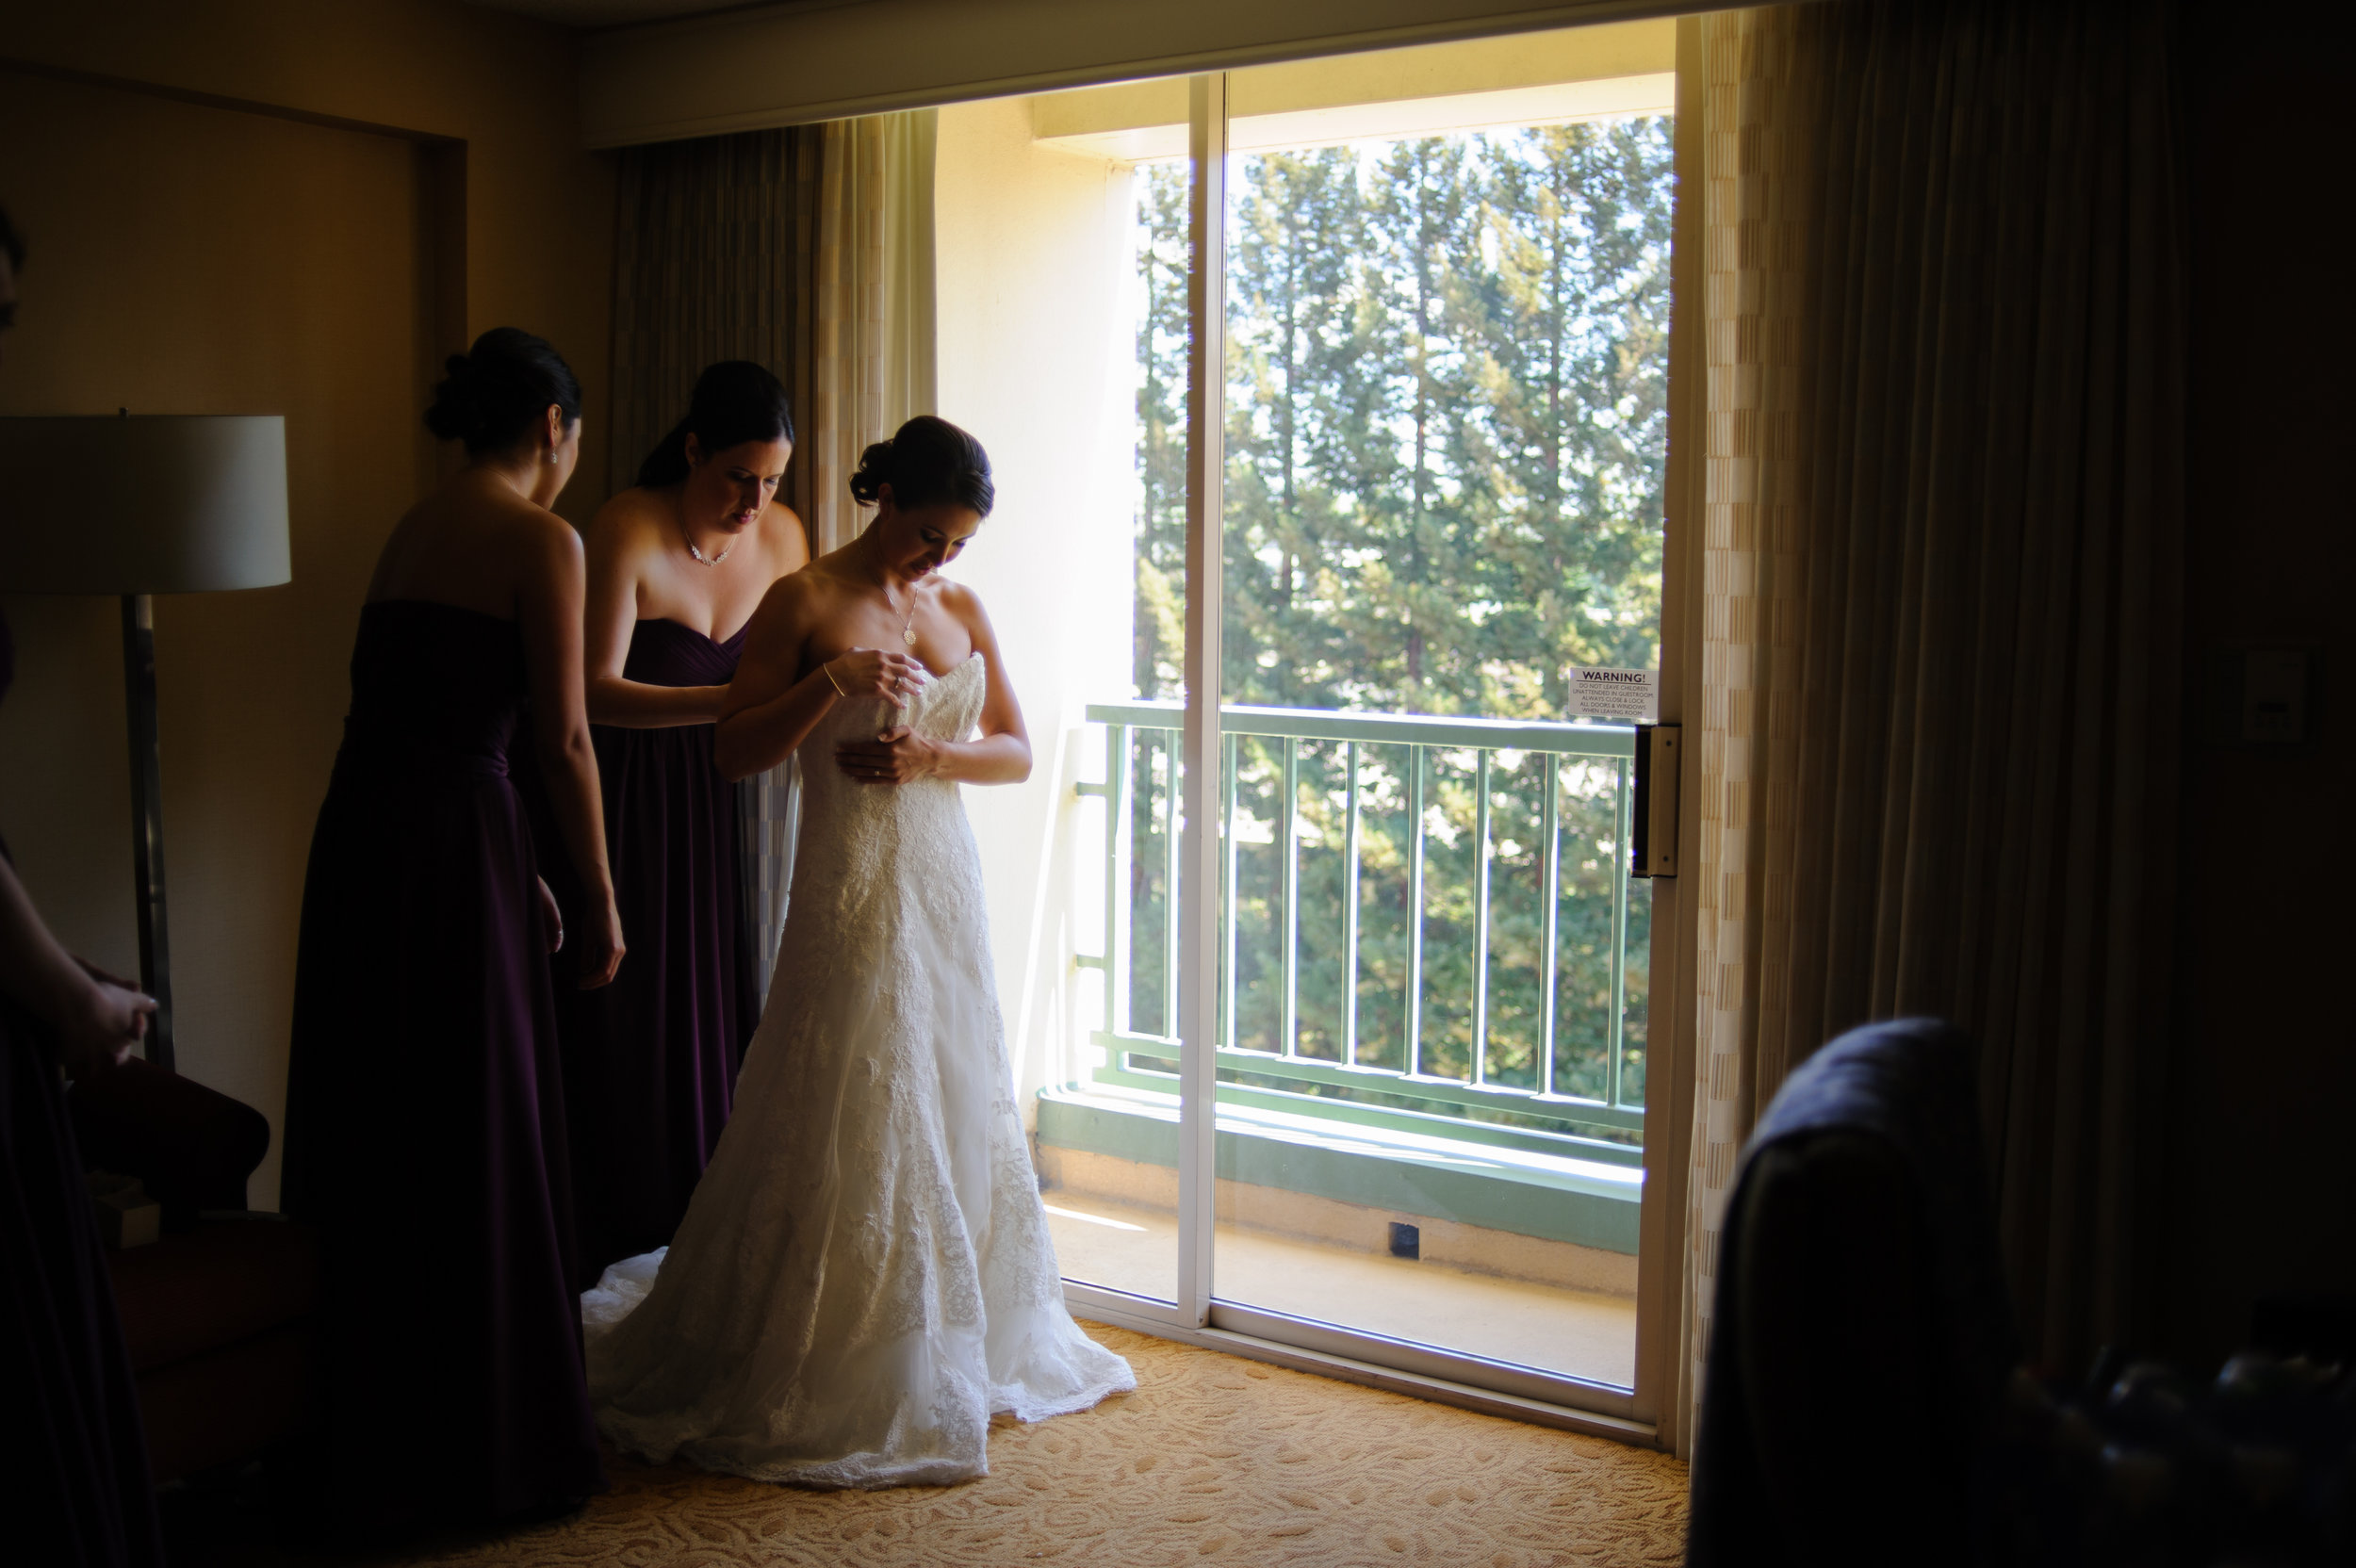 lindsey-jake-002-the-bridges-golf-course-san-ramon-wedding-photographer-katherine-nicole-photography.JPG